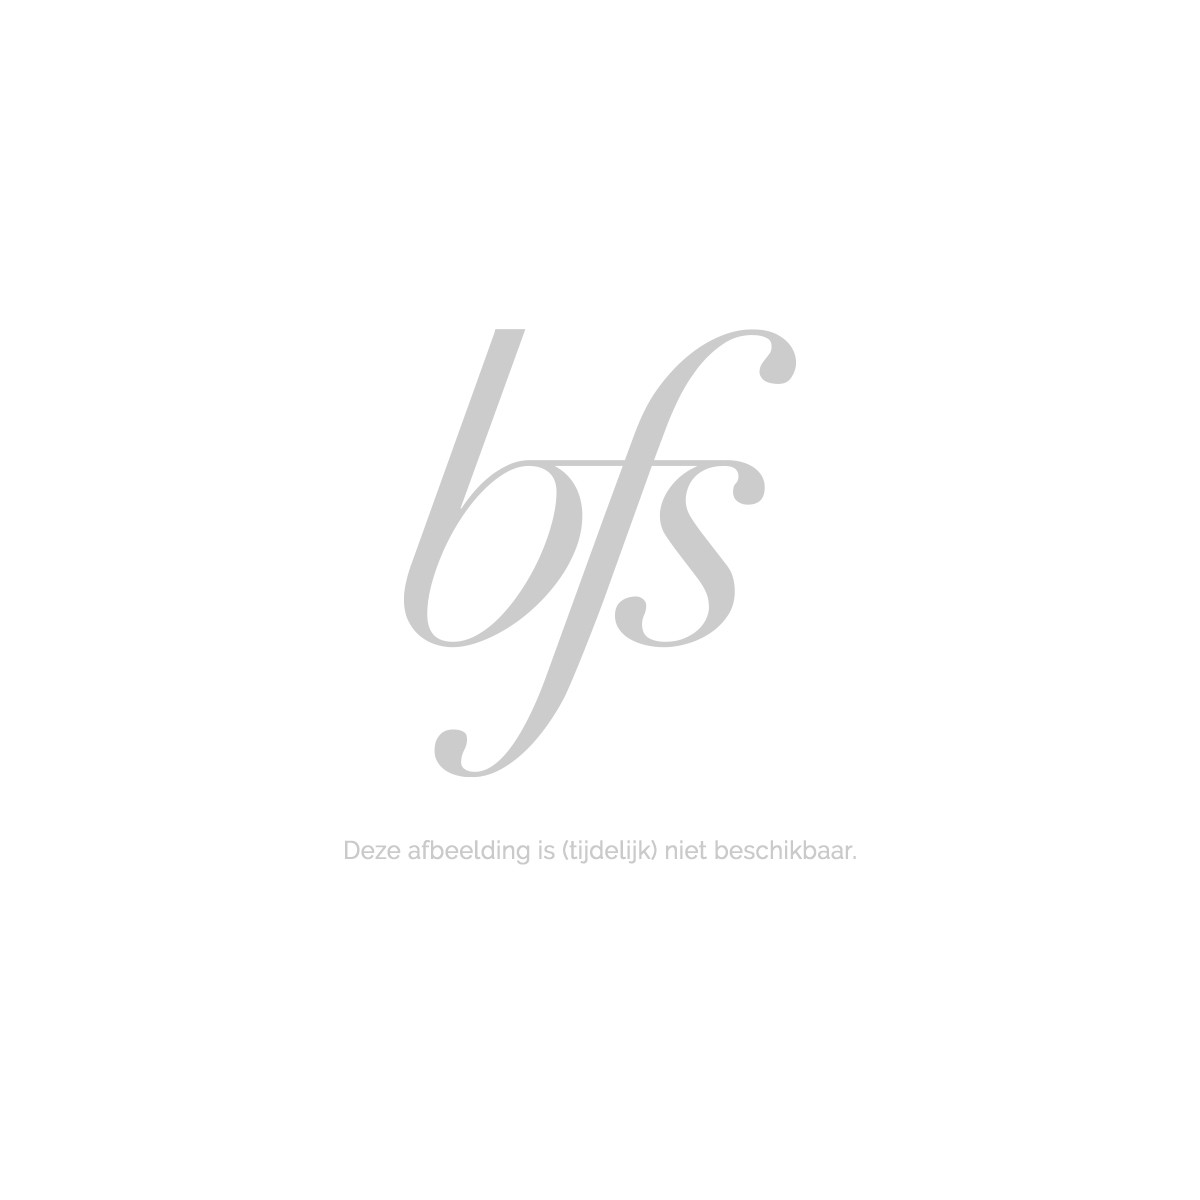 Dippn Perfect Dippn #001 Soft White 25Gr